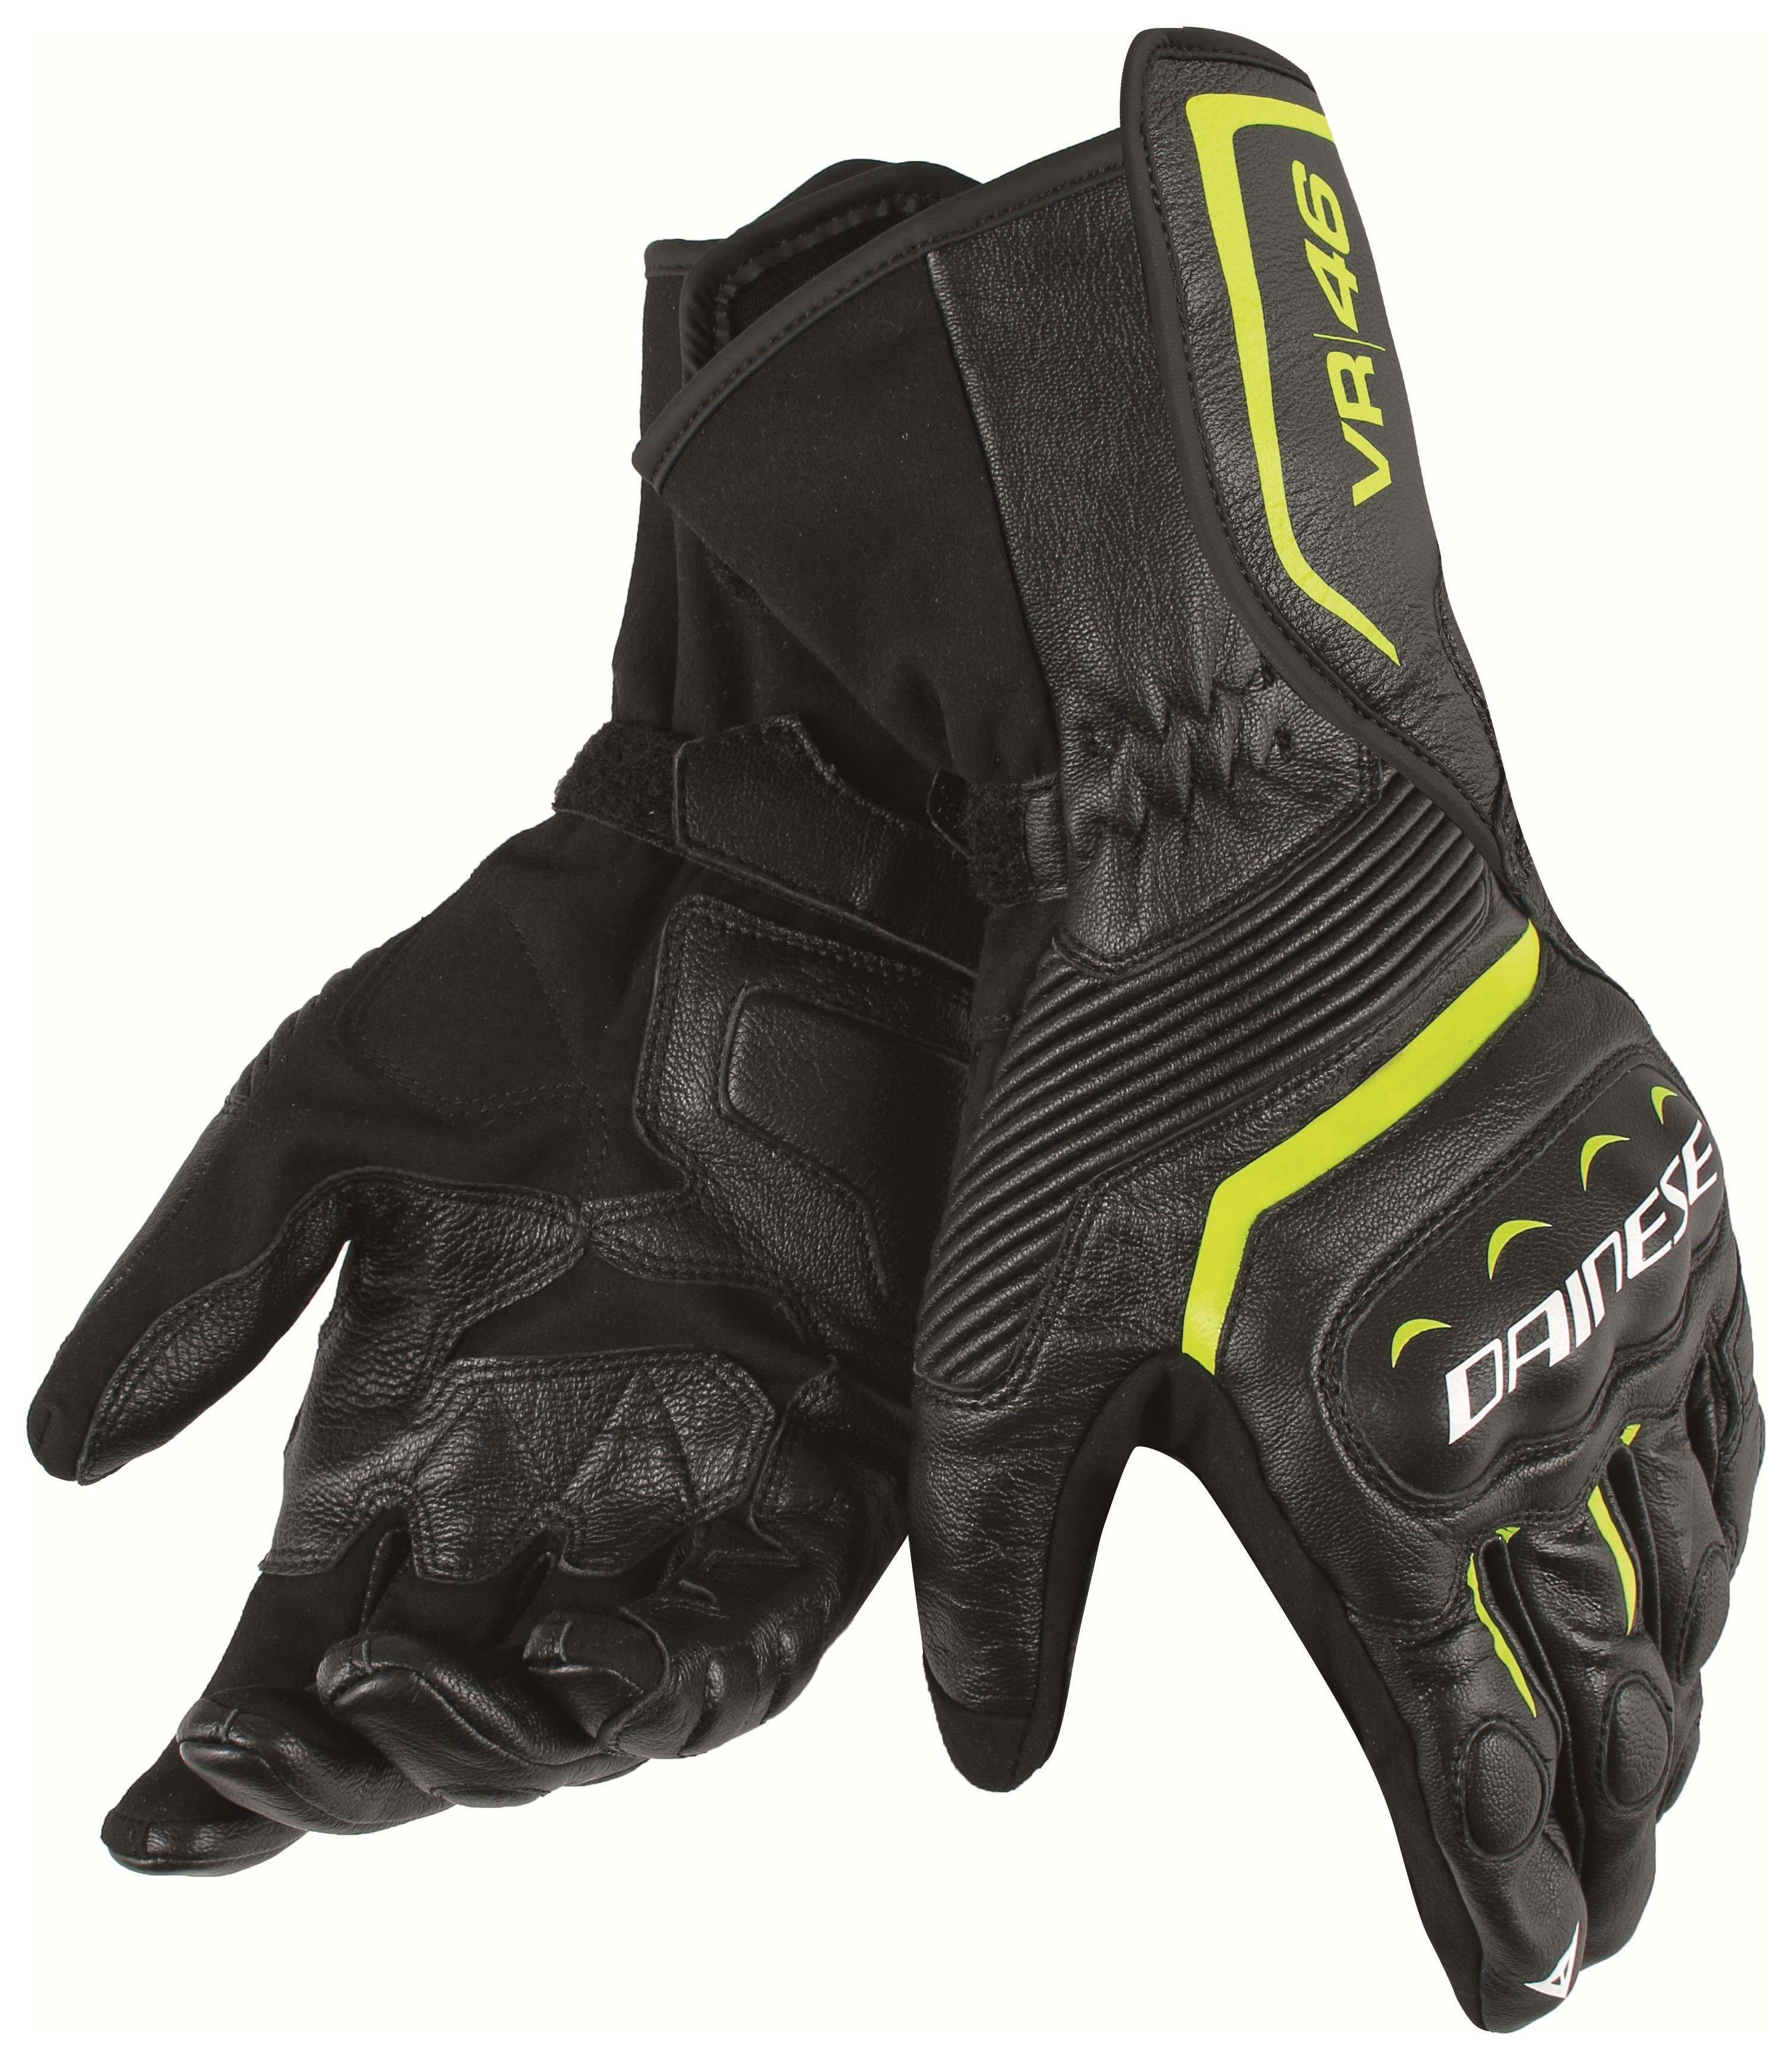 Full Face Cruiser Helmets >> Dainese Assen VR46 Gloves (3XL)   25% ($37.49) Off! - RevZilla